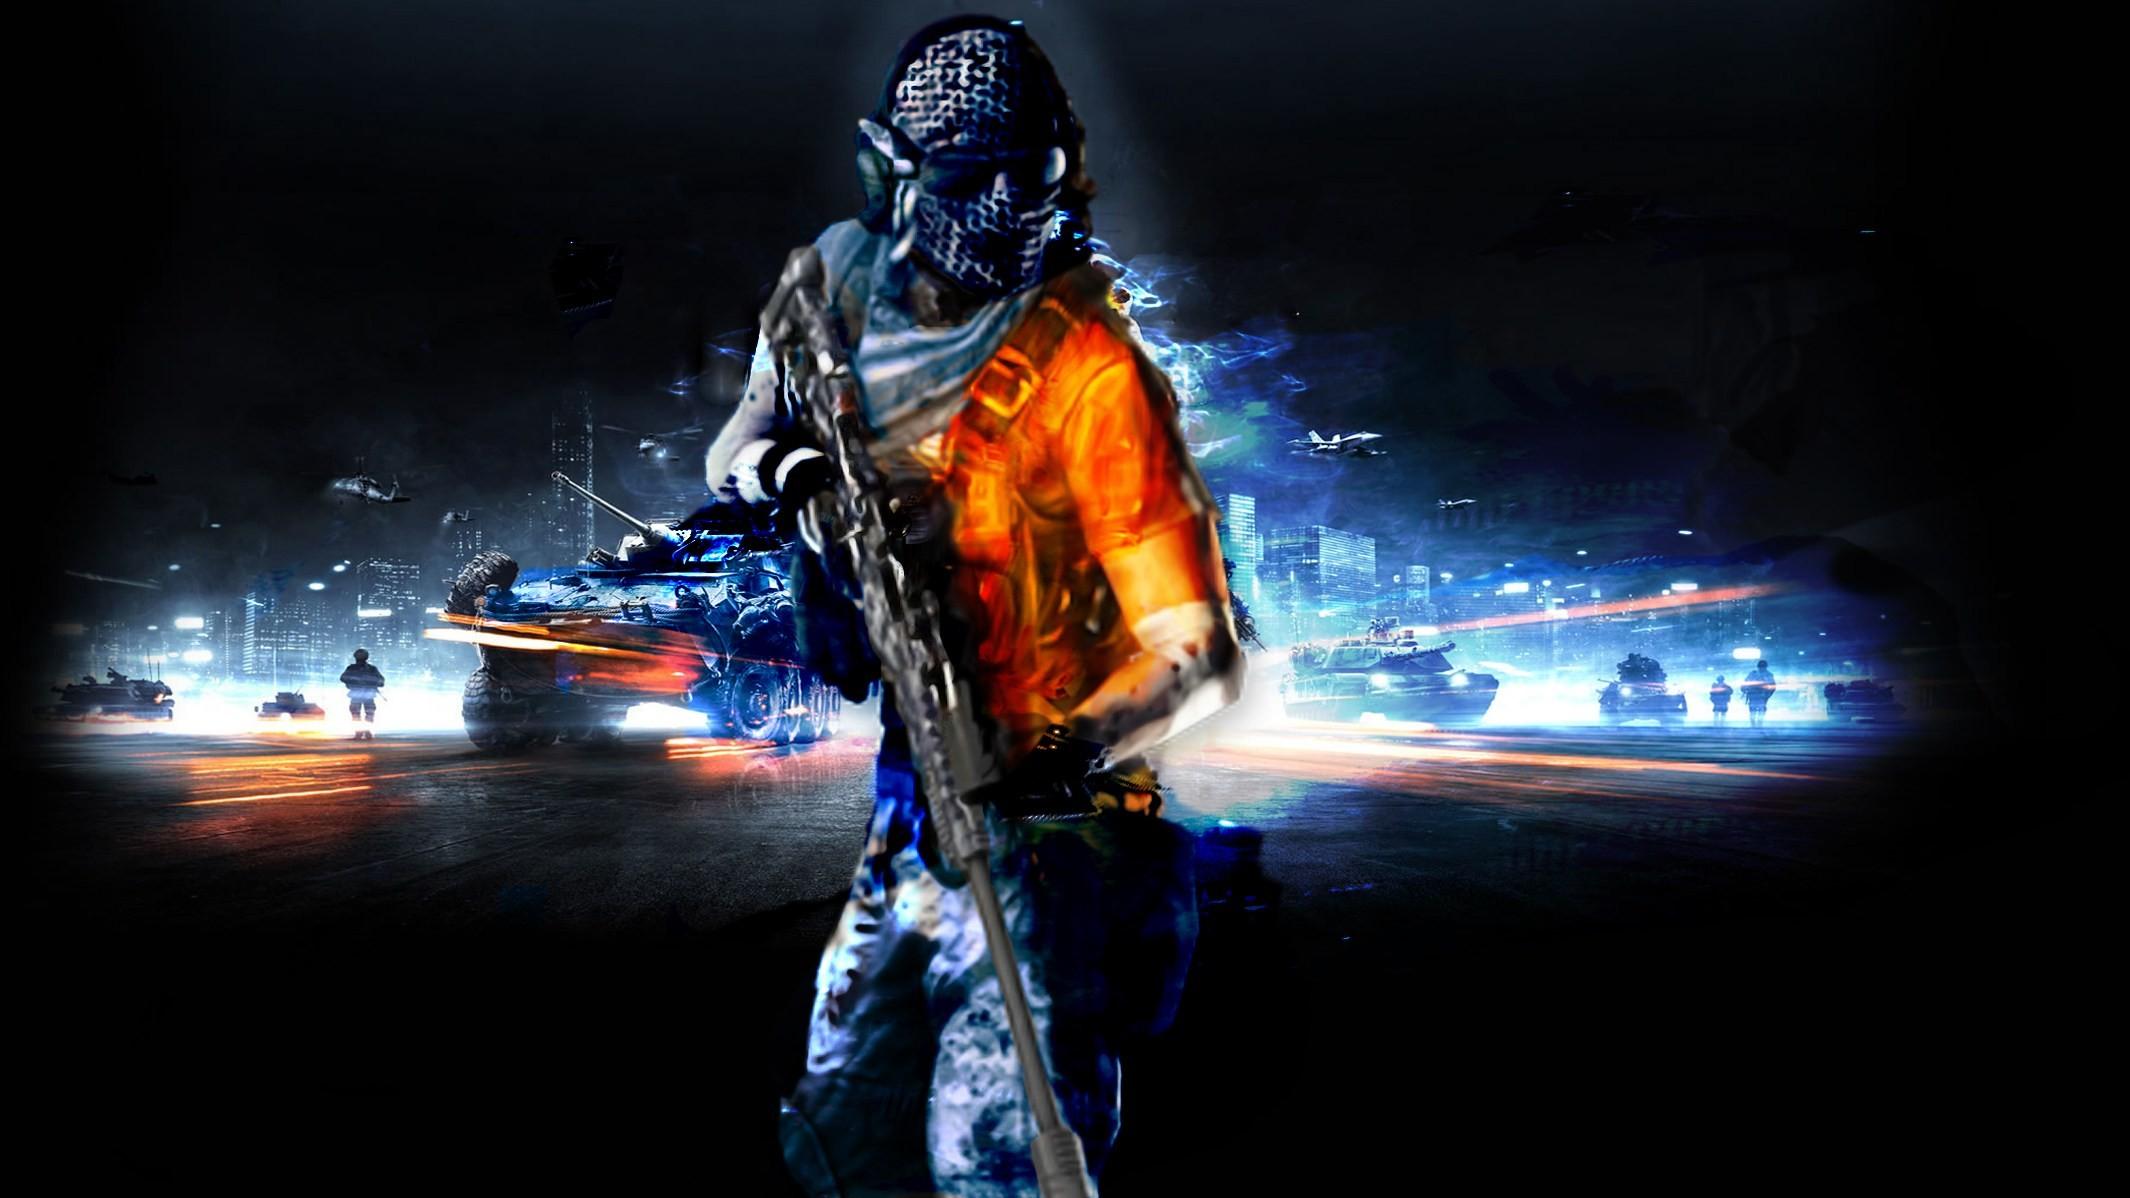 Res: 2130x1198, Battlefield 3 Sniper Wallpapers 17277 Amazing Wallpaperz